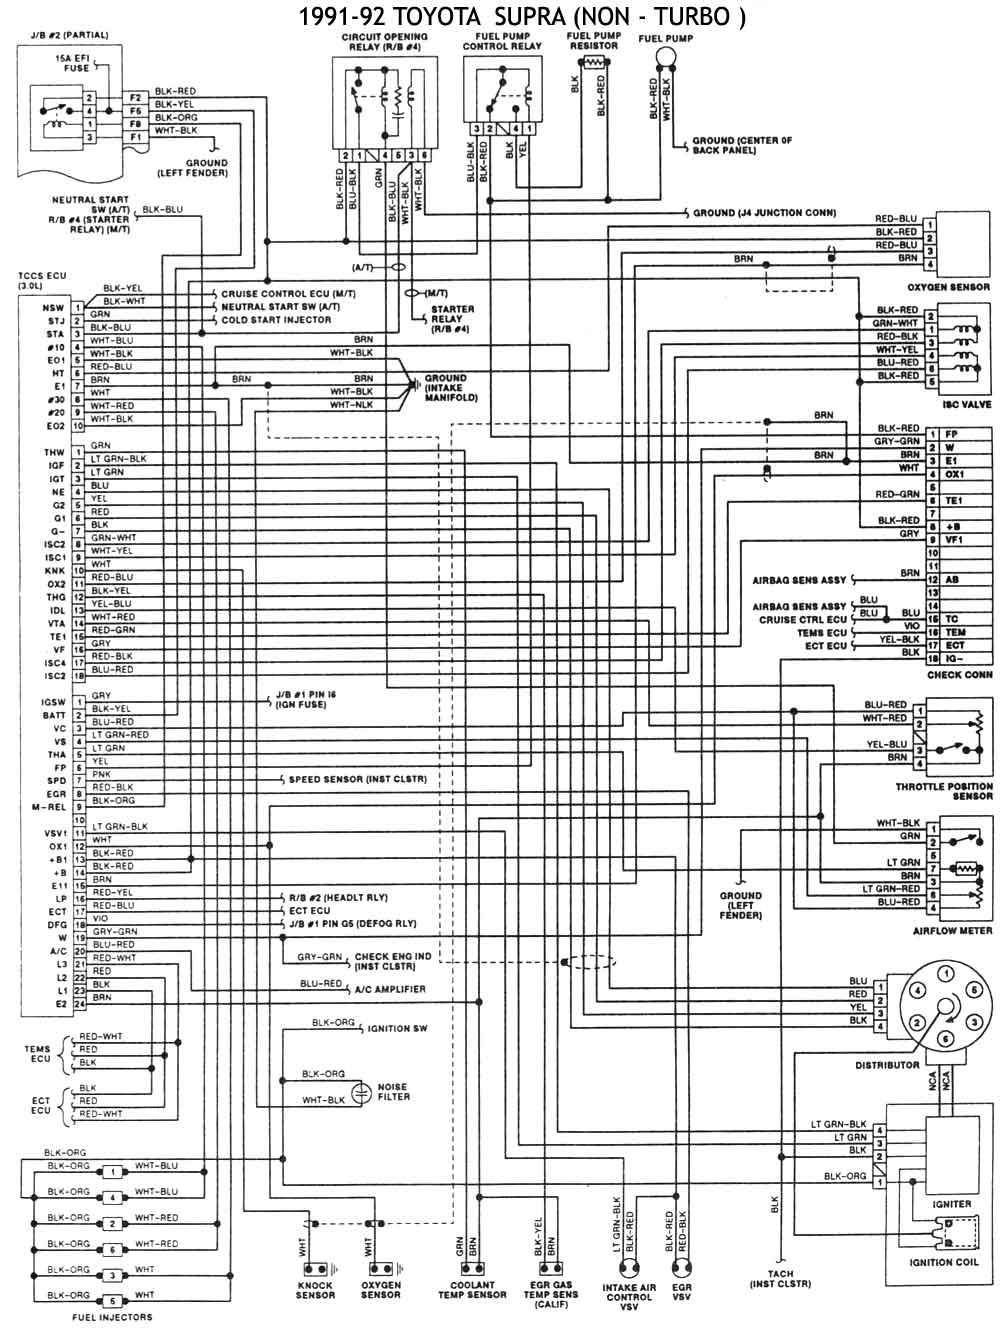 Toyota 1986 93 Diagramas Esquemas Ubicacion De Components 1992 4runner Ecu 1991 92 No Turbo